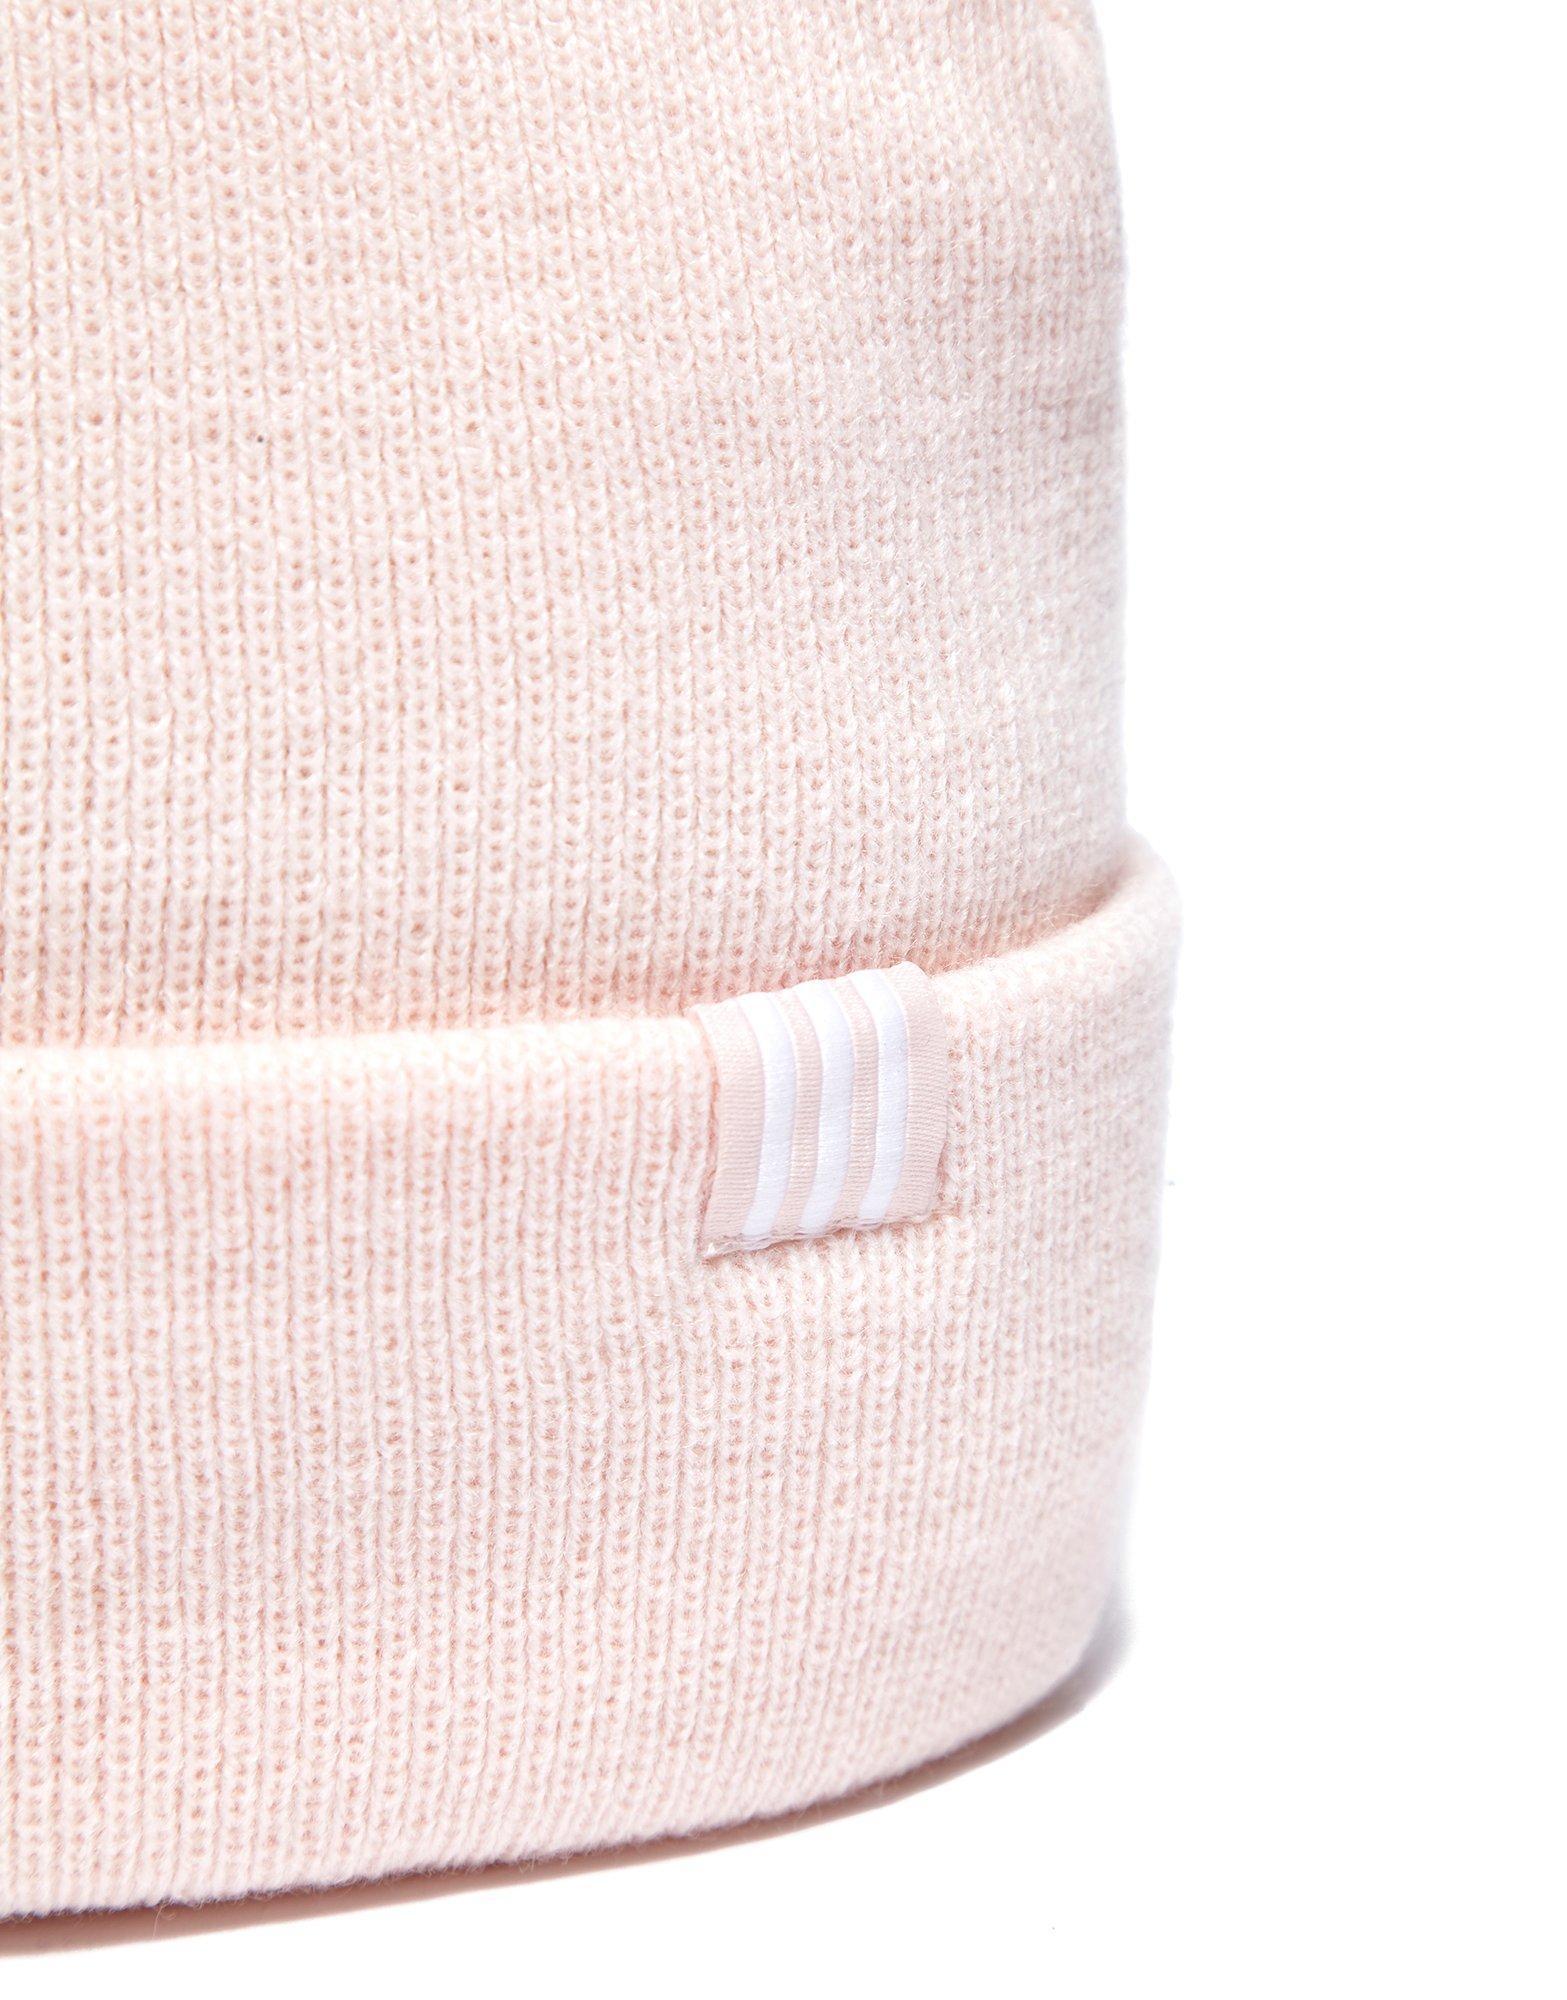 c015764c736 Lyst - adidas Originals Trefoil Beanie Hat in Pink for Men